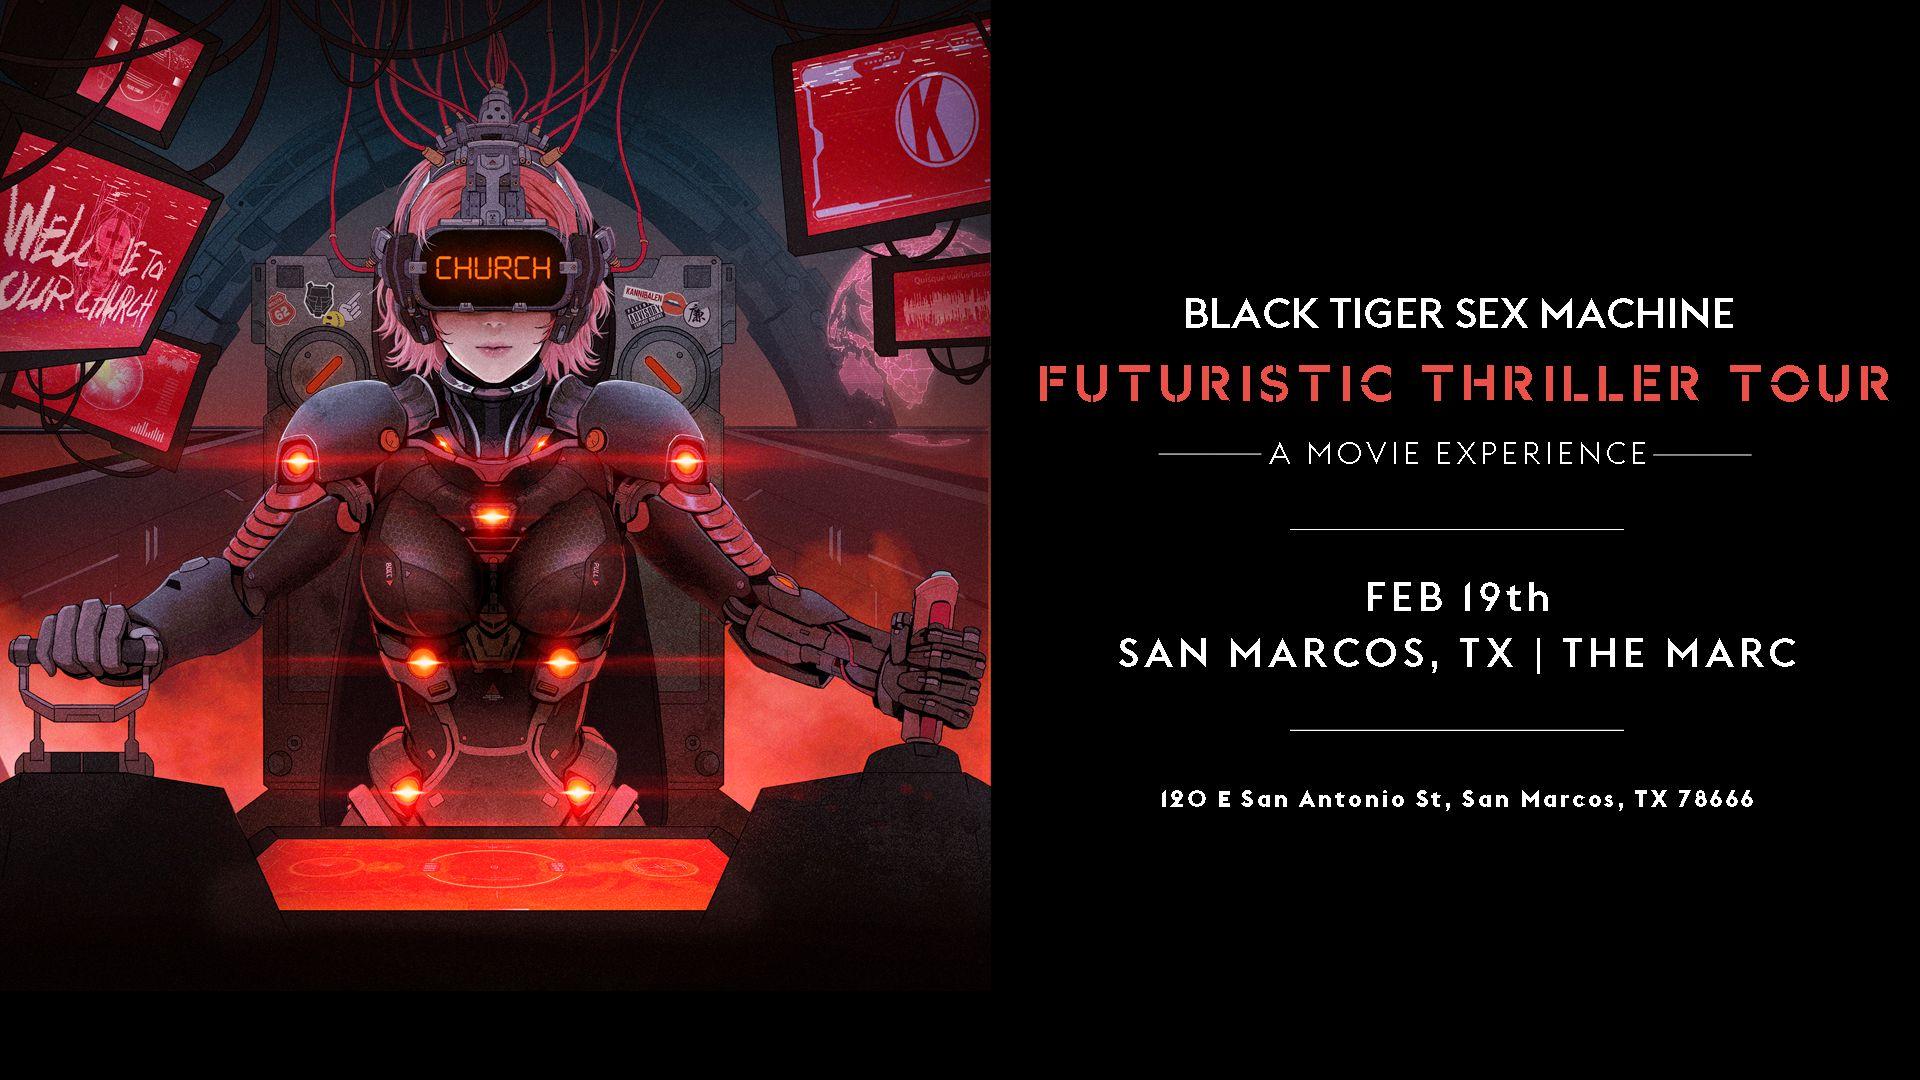 BTSM @ San Marcos Fb event banner (1).jpg